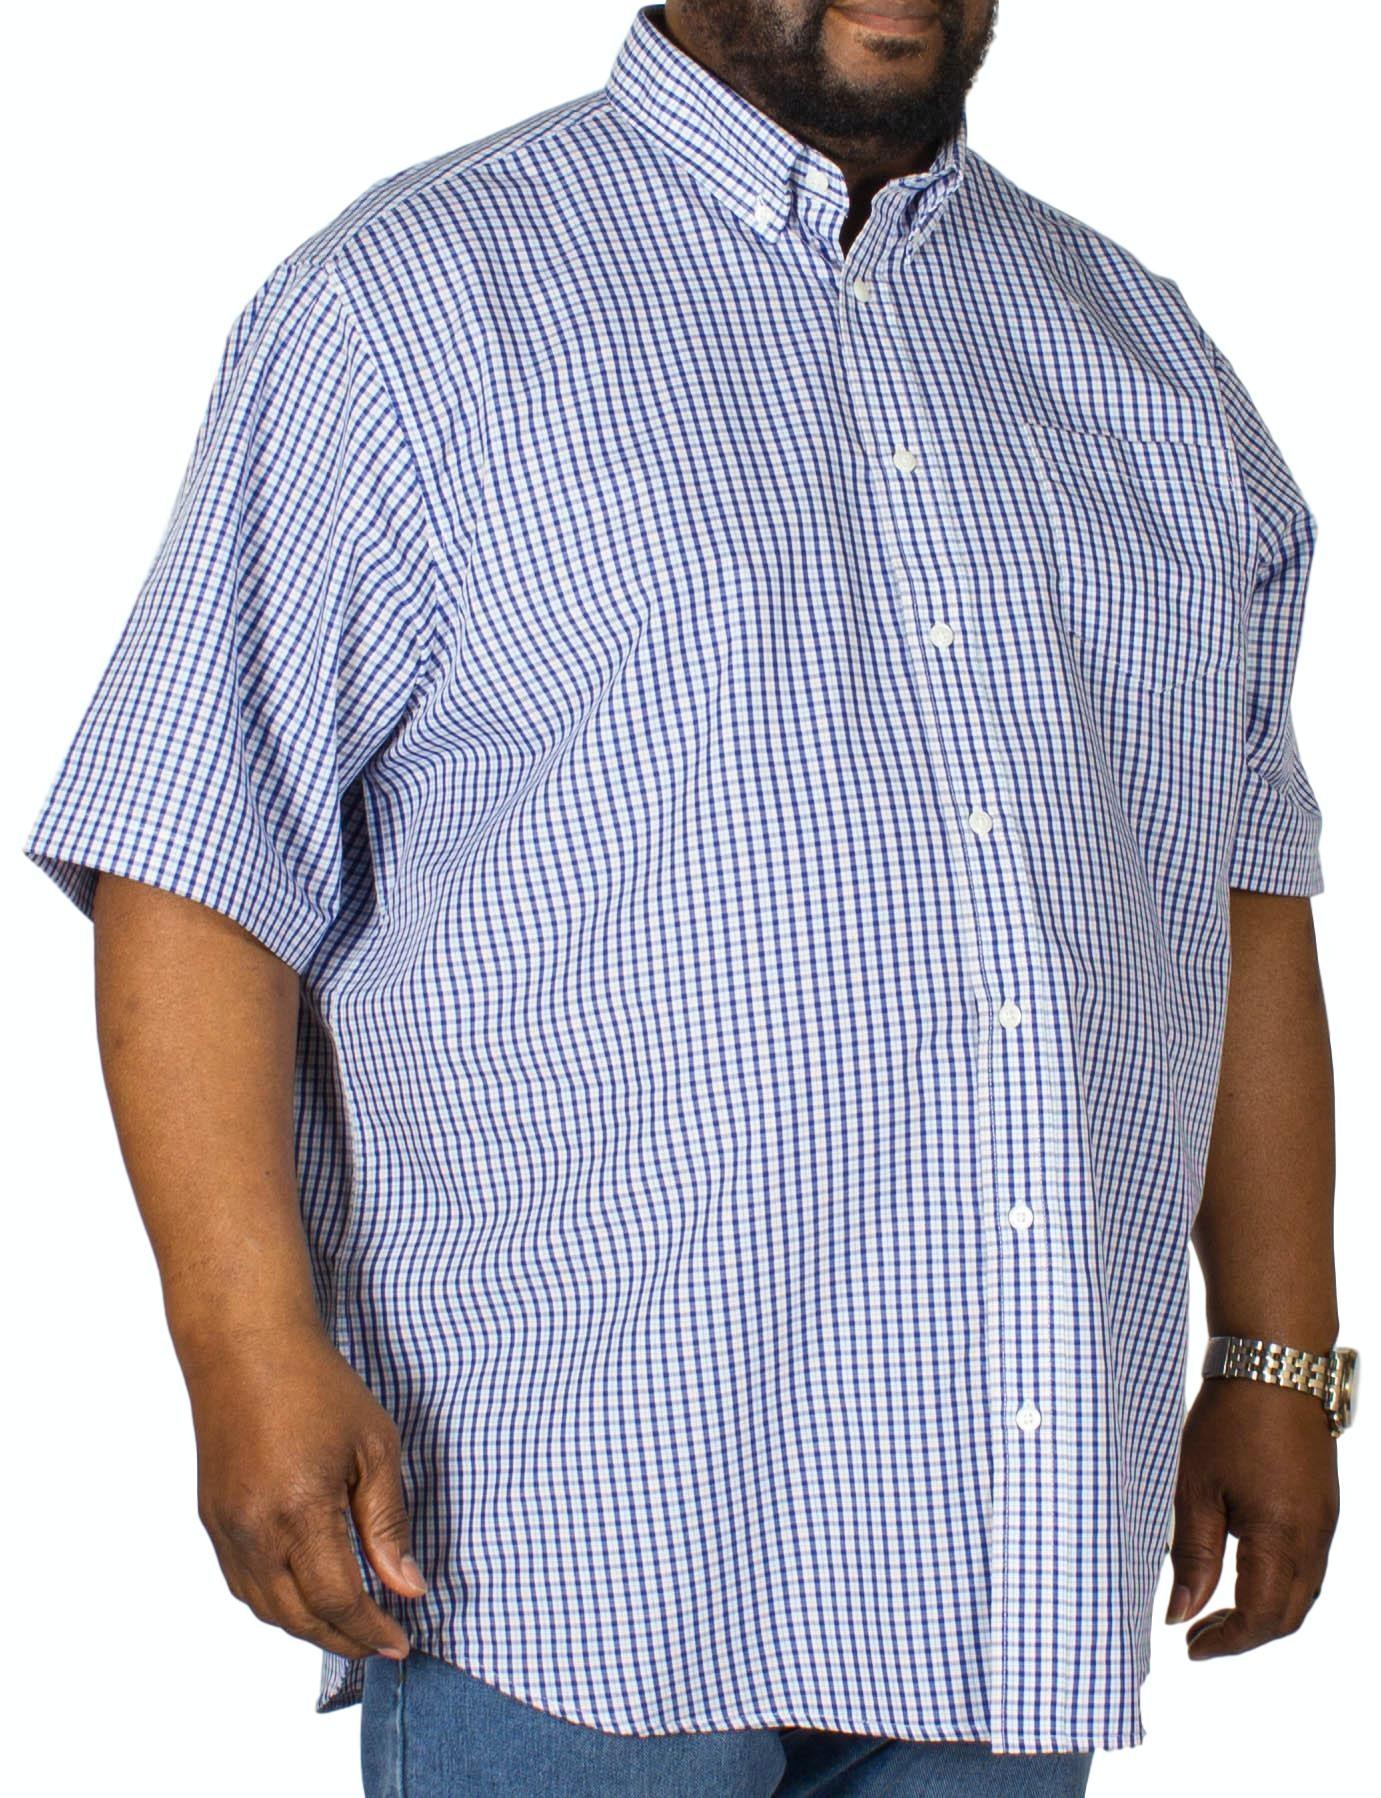 Carabou Check Short Sleeve Shirt Navy